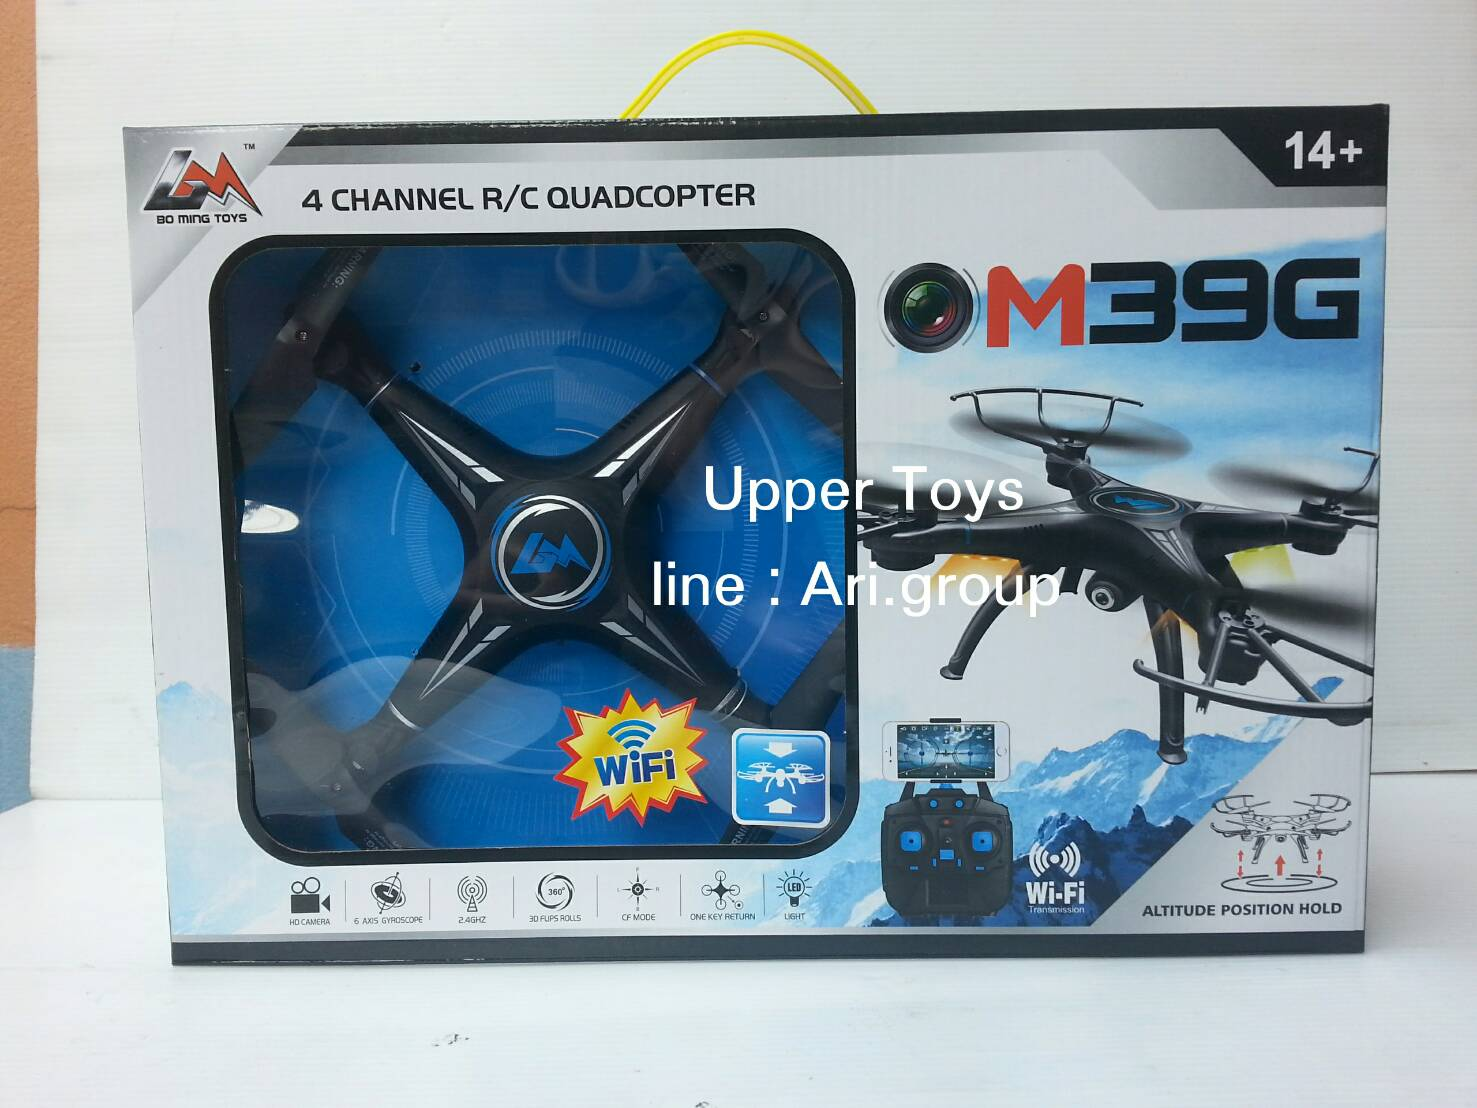 drone m39g wifi ล็อคความสูงได้ เล่นง่ายมาก เหมาะสำหรับมือใหม่ มี wifi(Black)